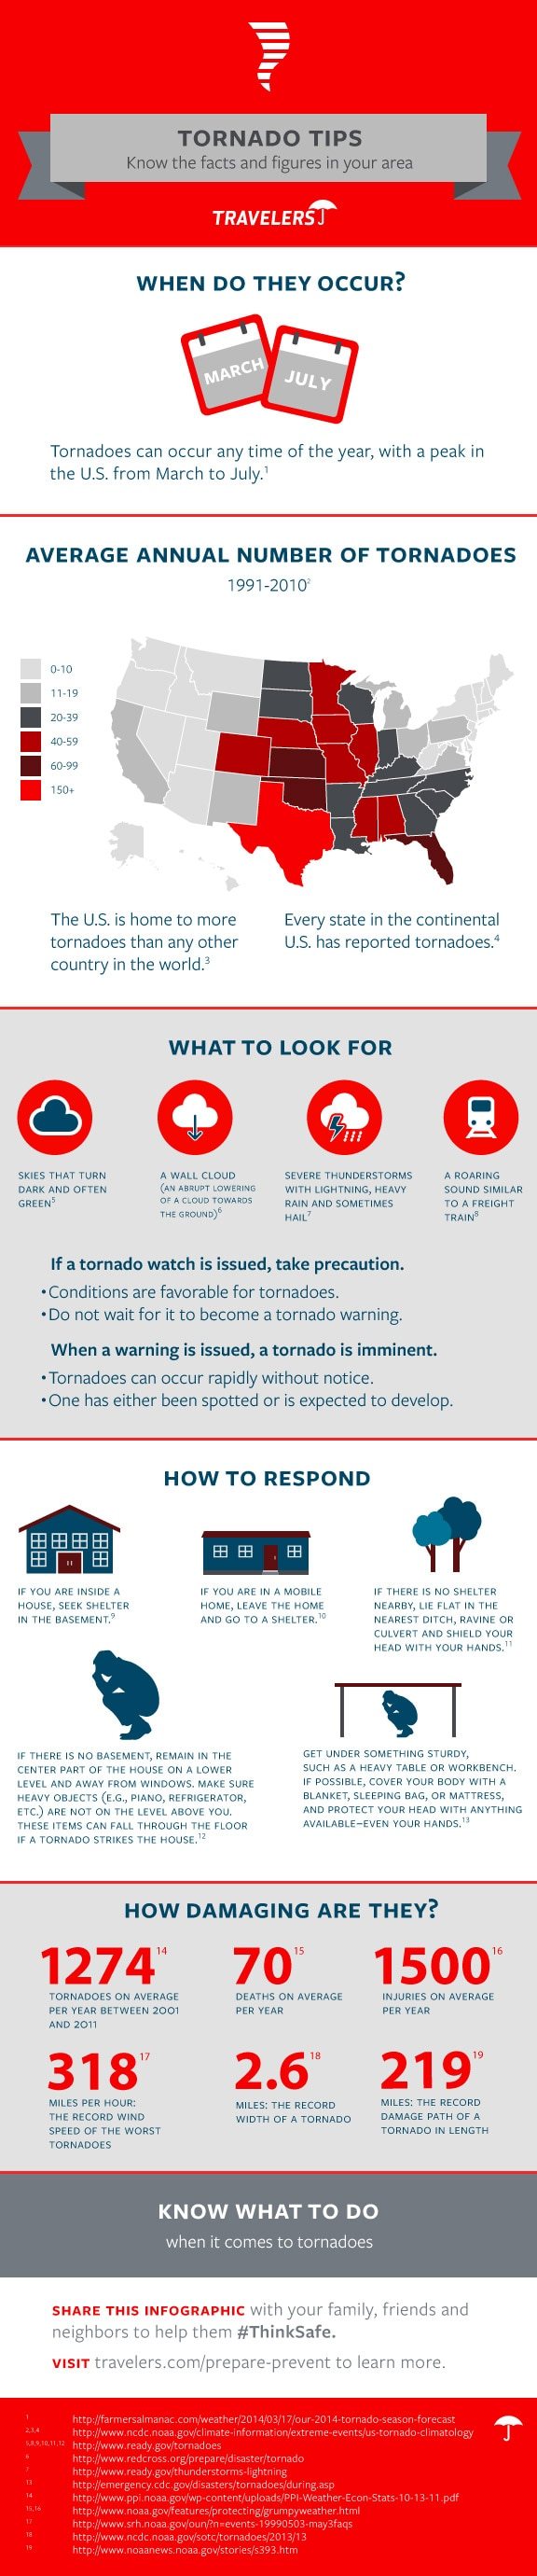 Tornado safety infographic